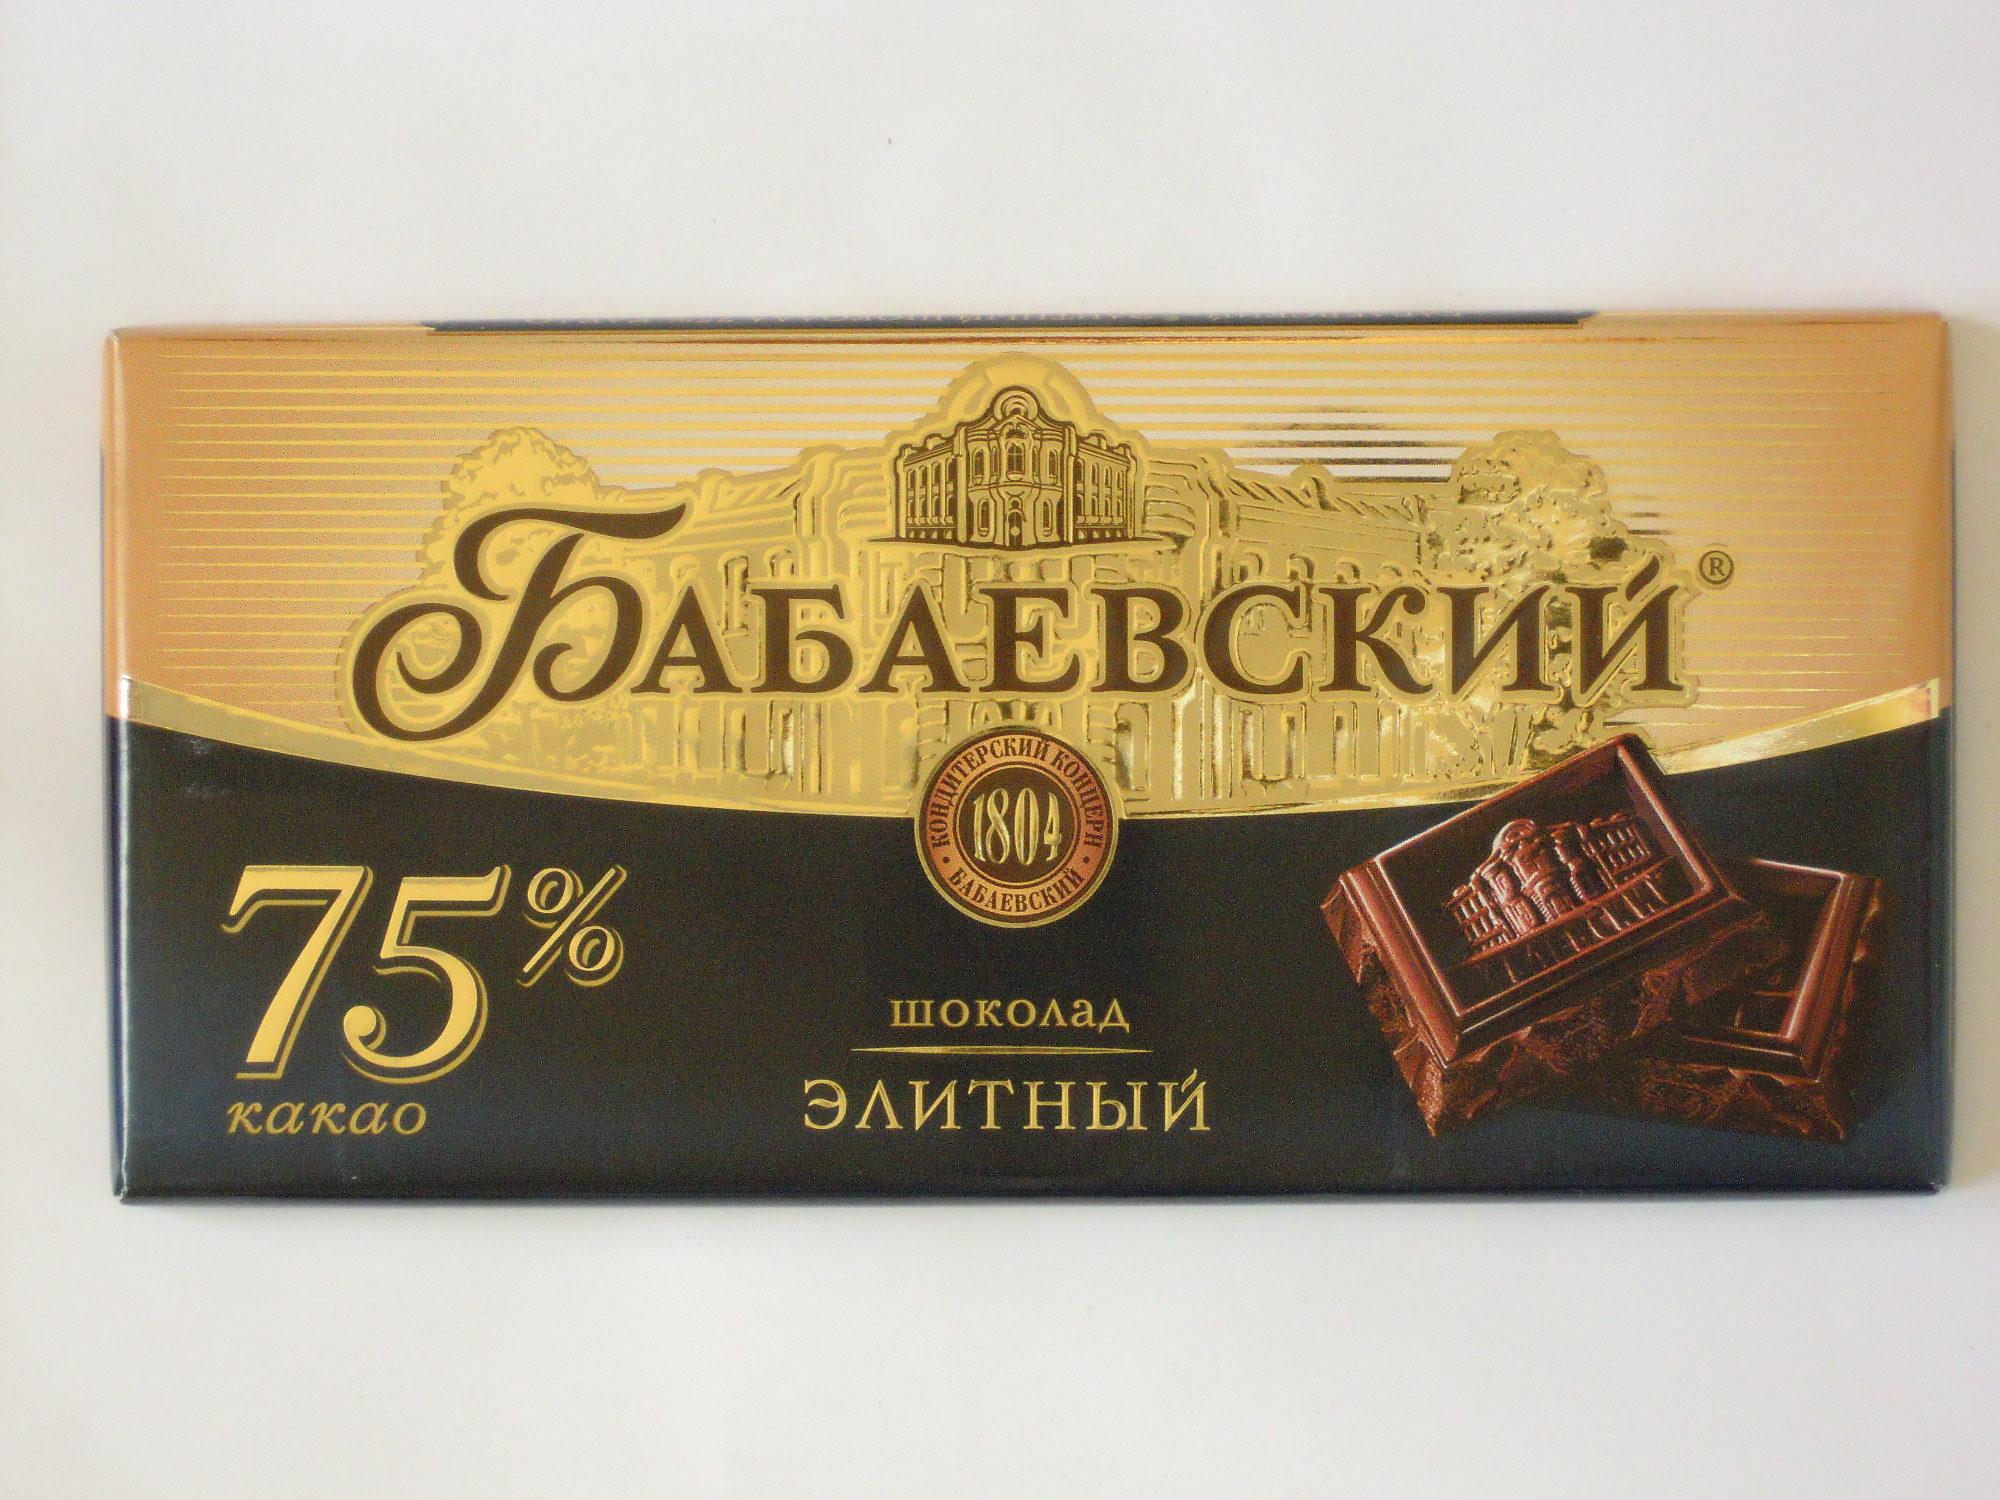 Шоколад бабаевский элитный картинка